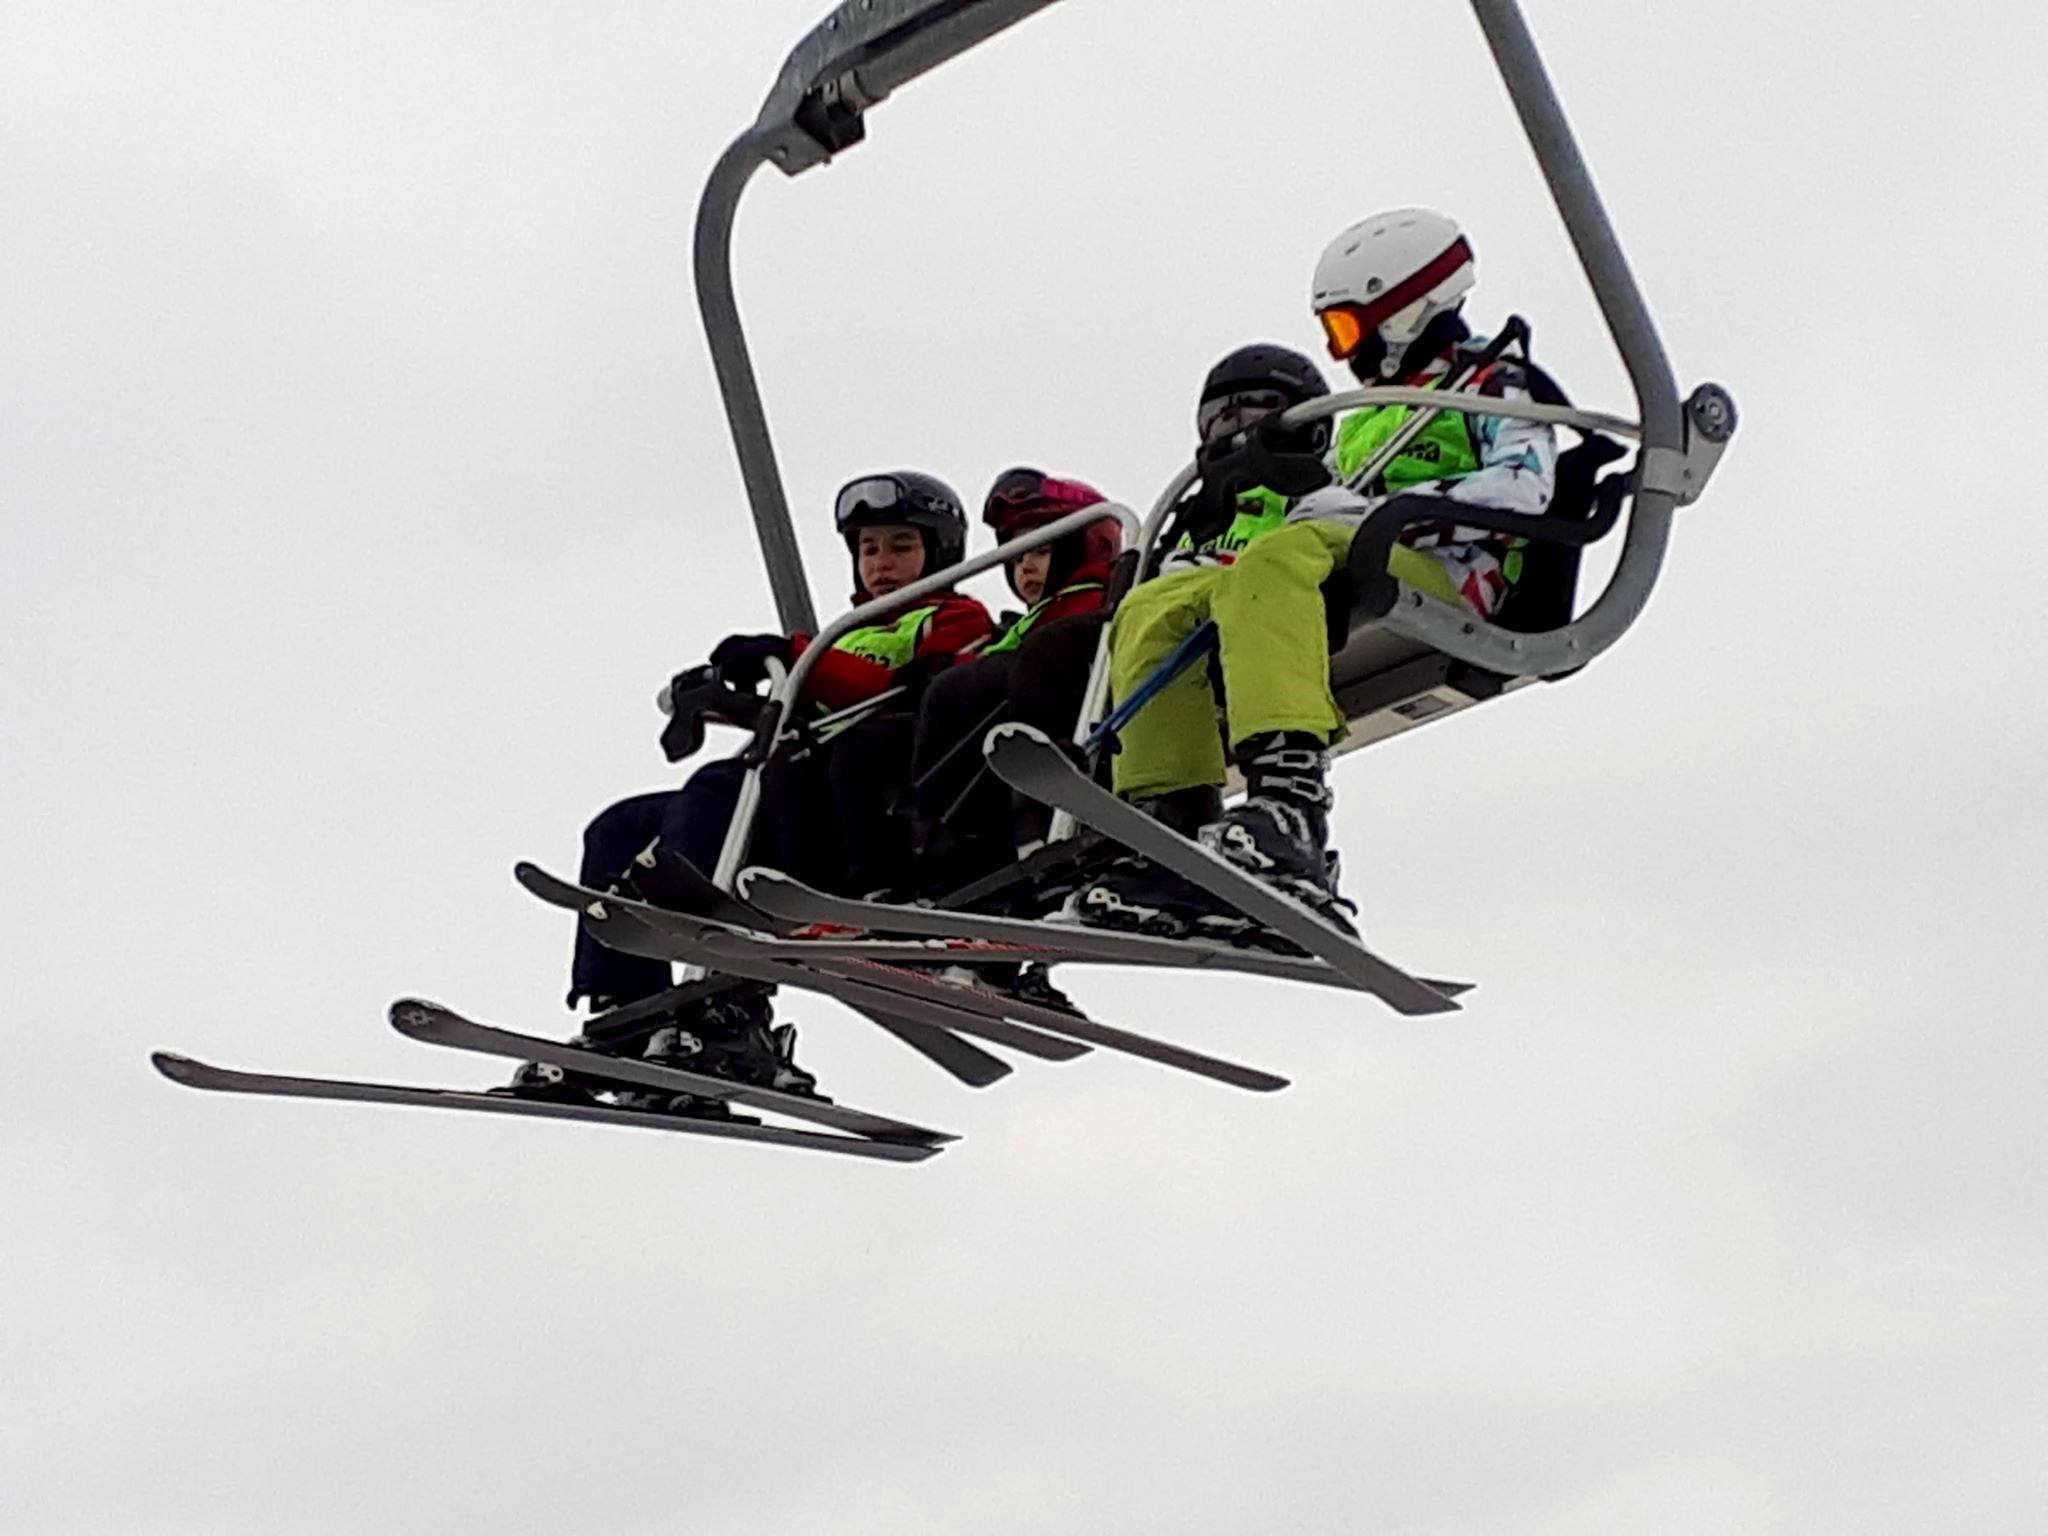 Mali pacjenci na nartach